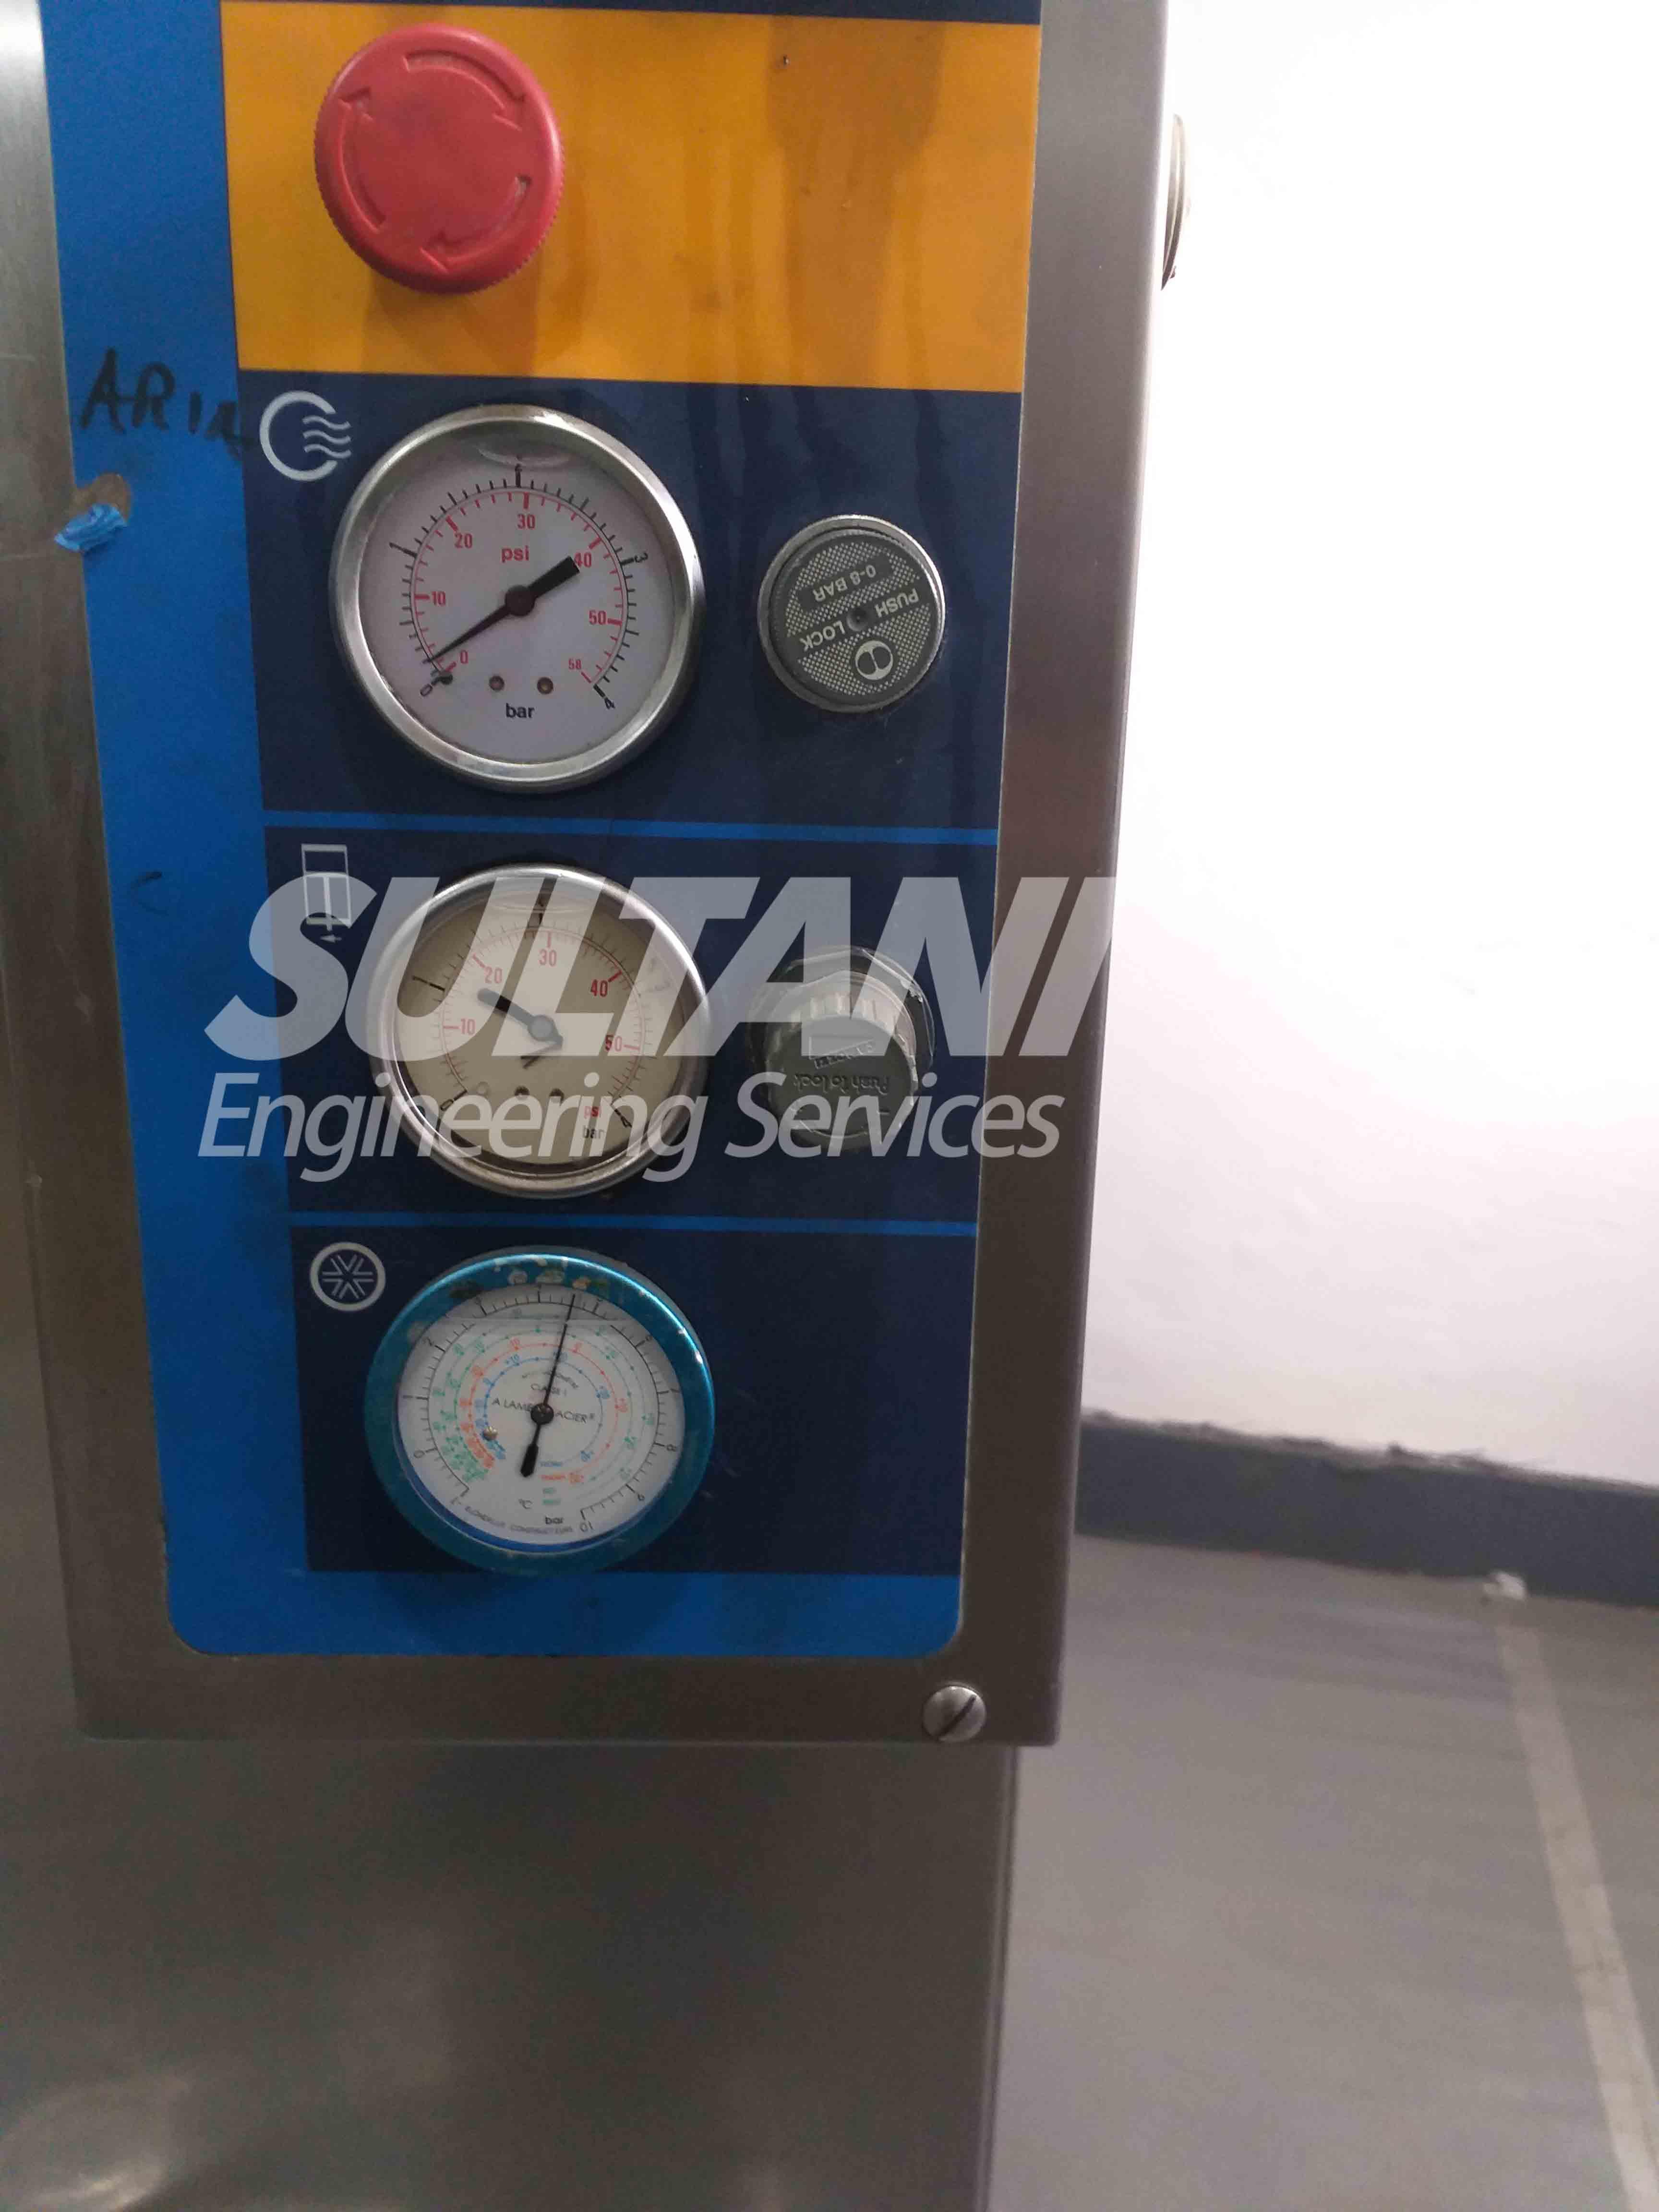 Tetra Pak 600 Ice Cream Continuous Freezer - sultanieng